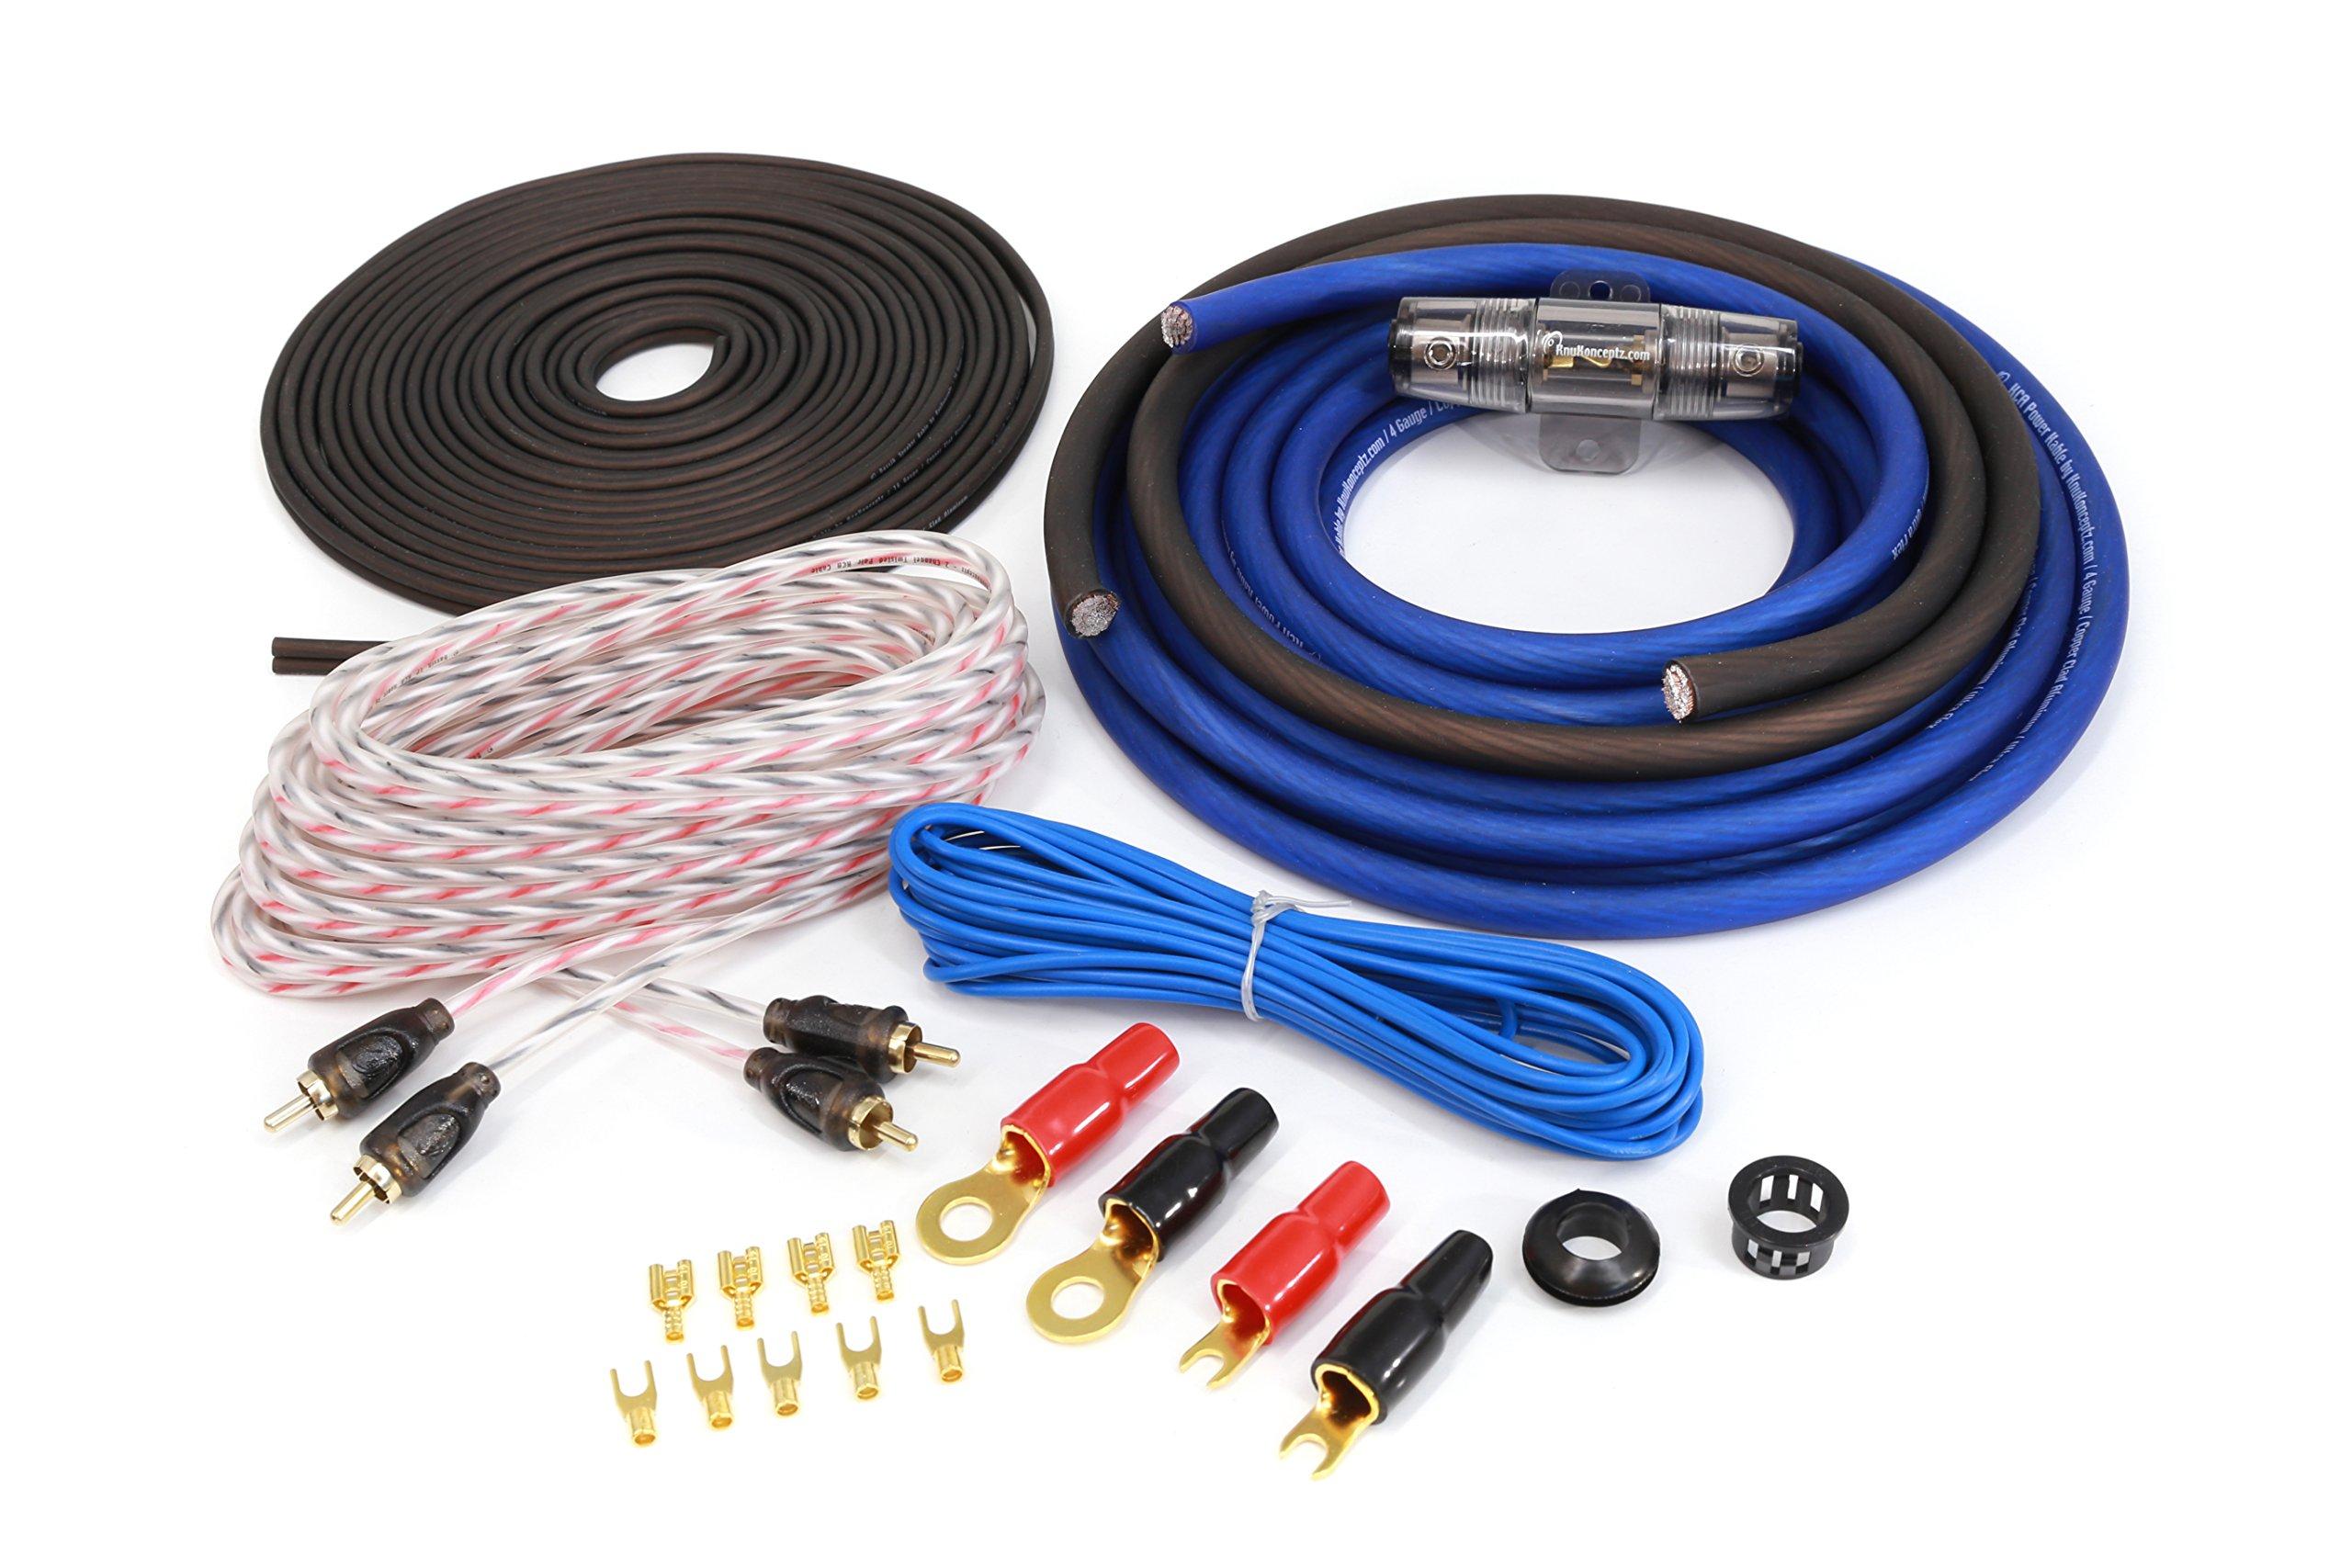 KnuKonceptz KCA Complete 4 Gauge Amp Installation Kit by KnuKonceptz